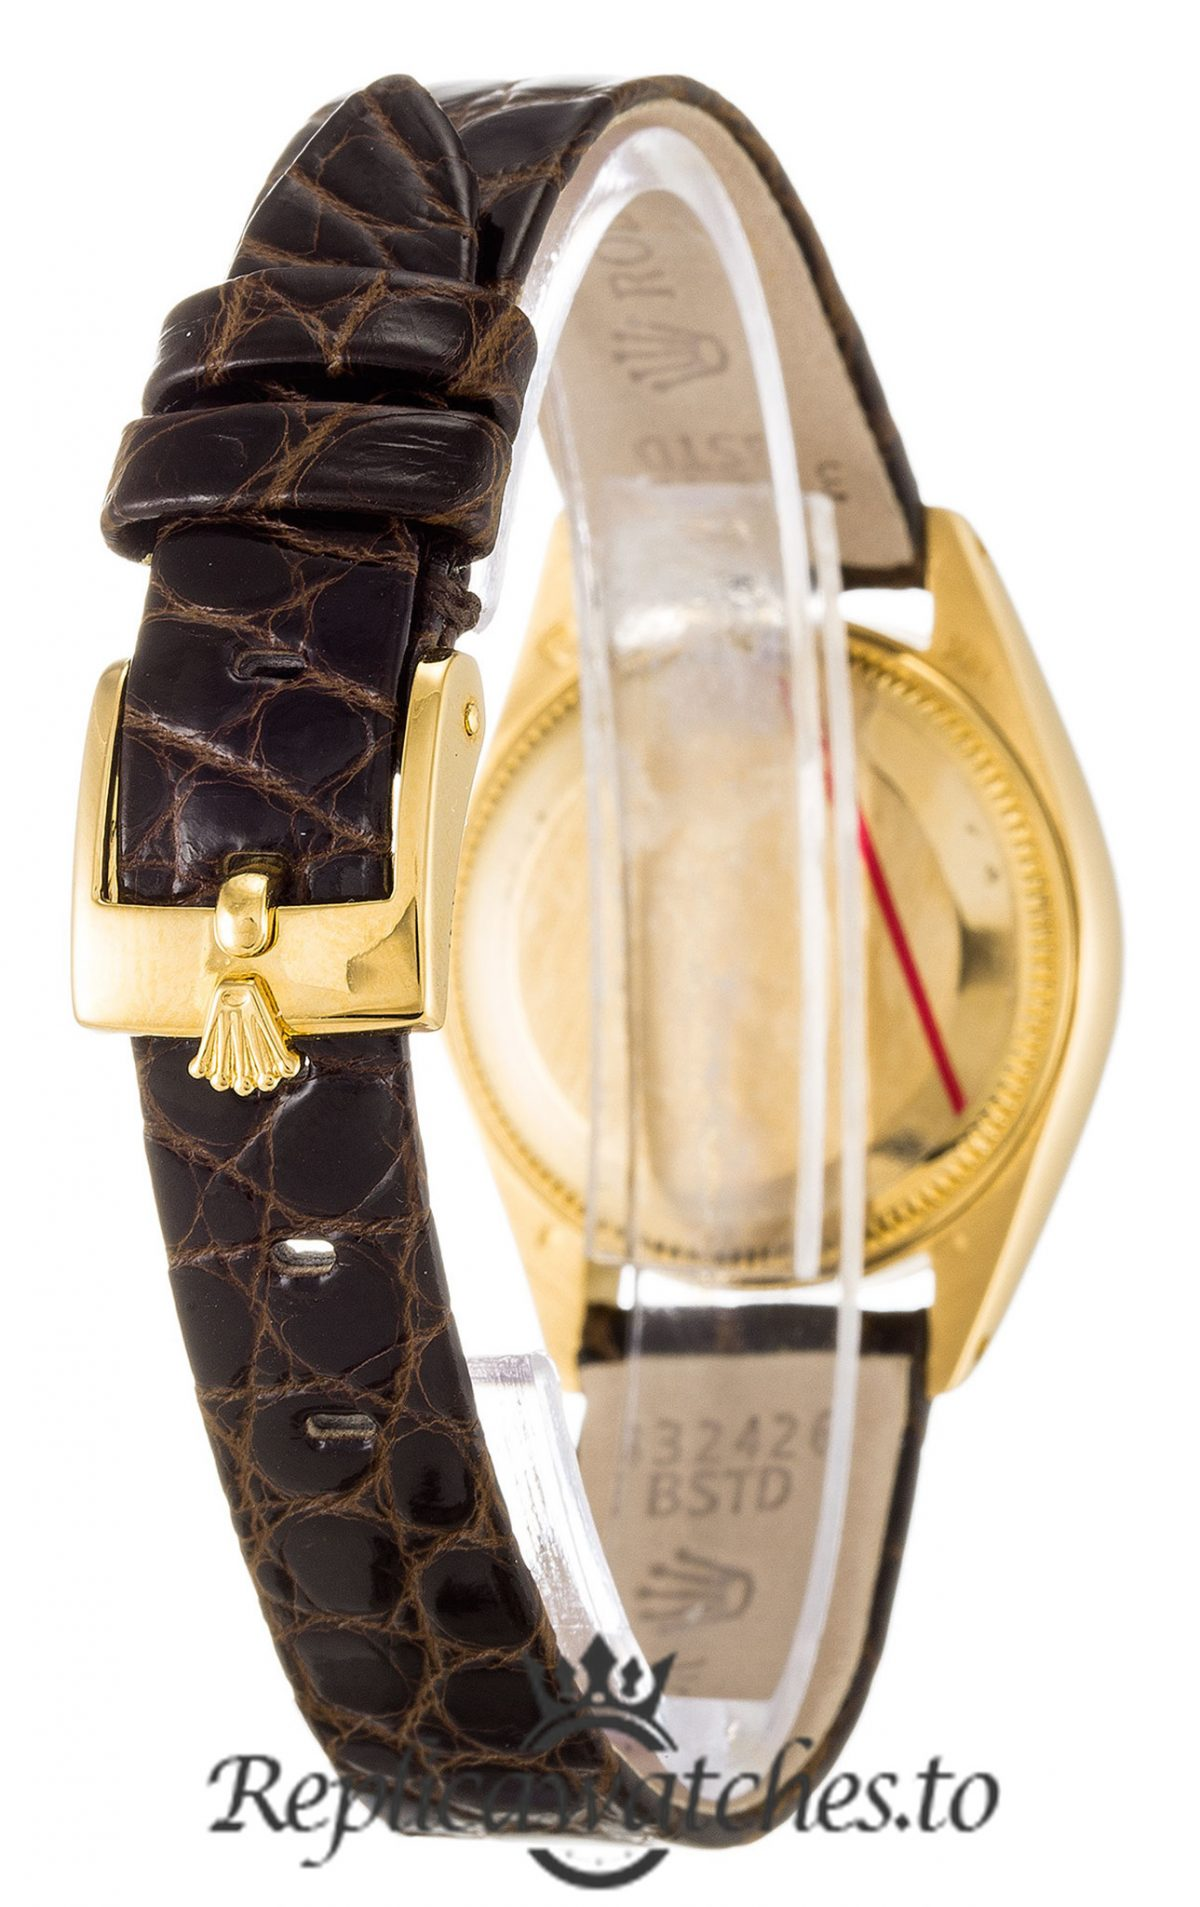 Rolex Datejust Replica 6916 Brown Strap 26MM